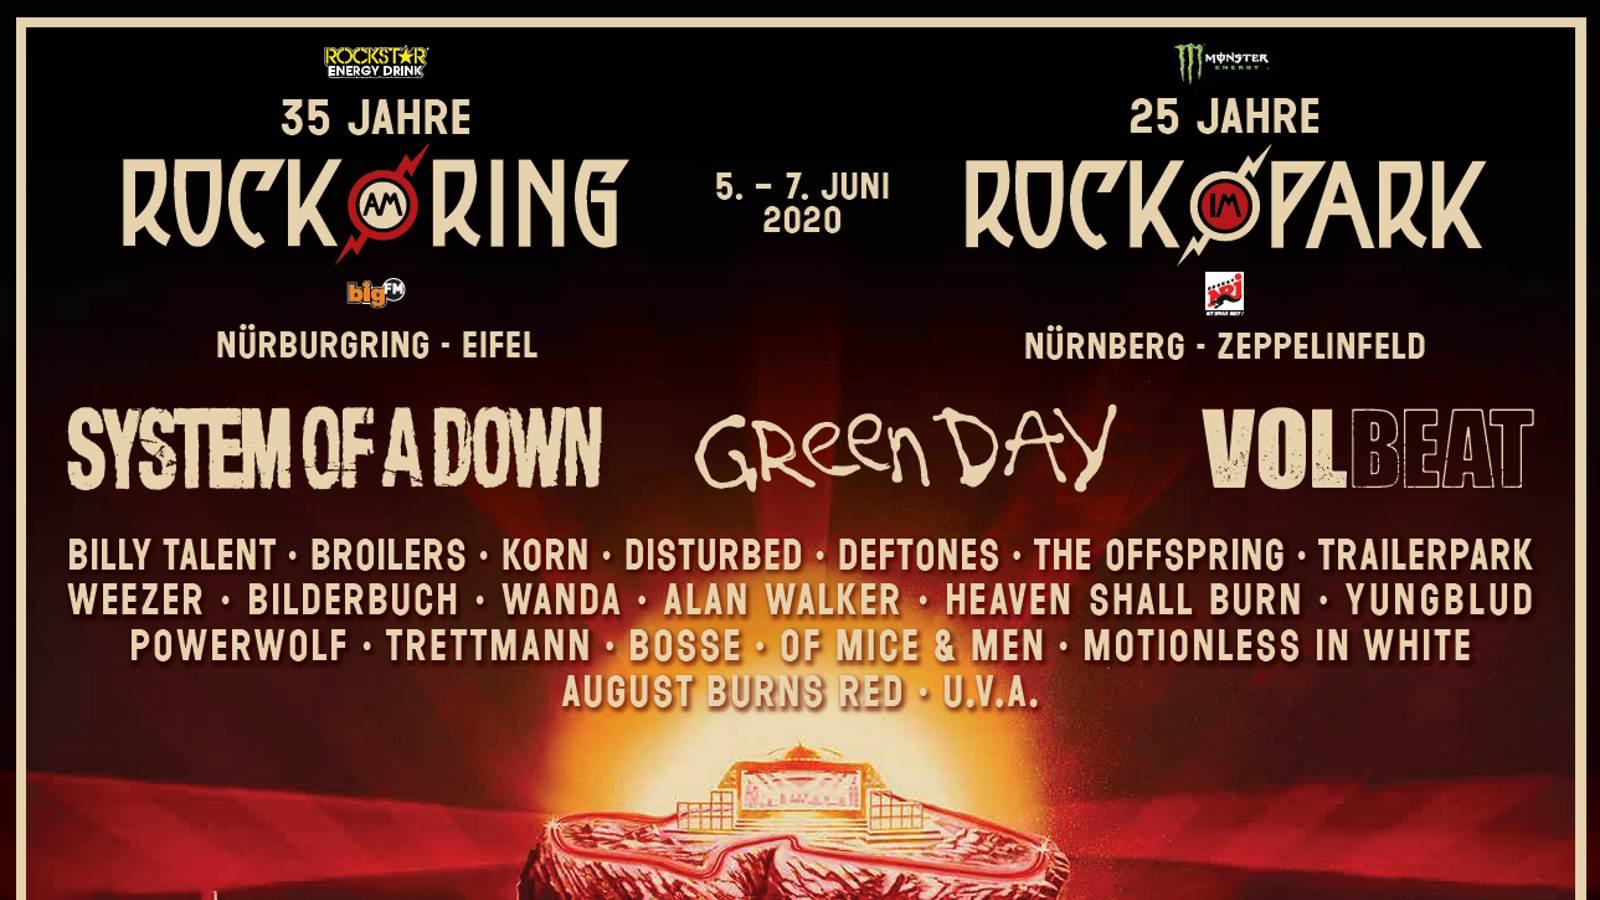 rock-im-park-2020-rock-am-ring-2020-bands-1